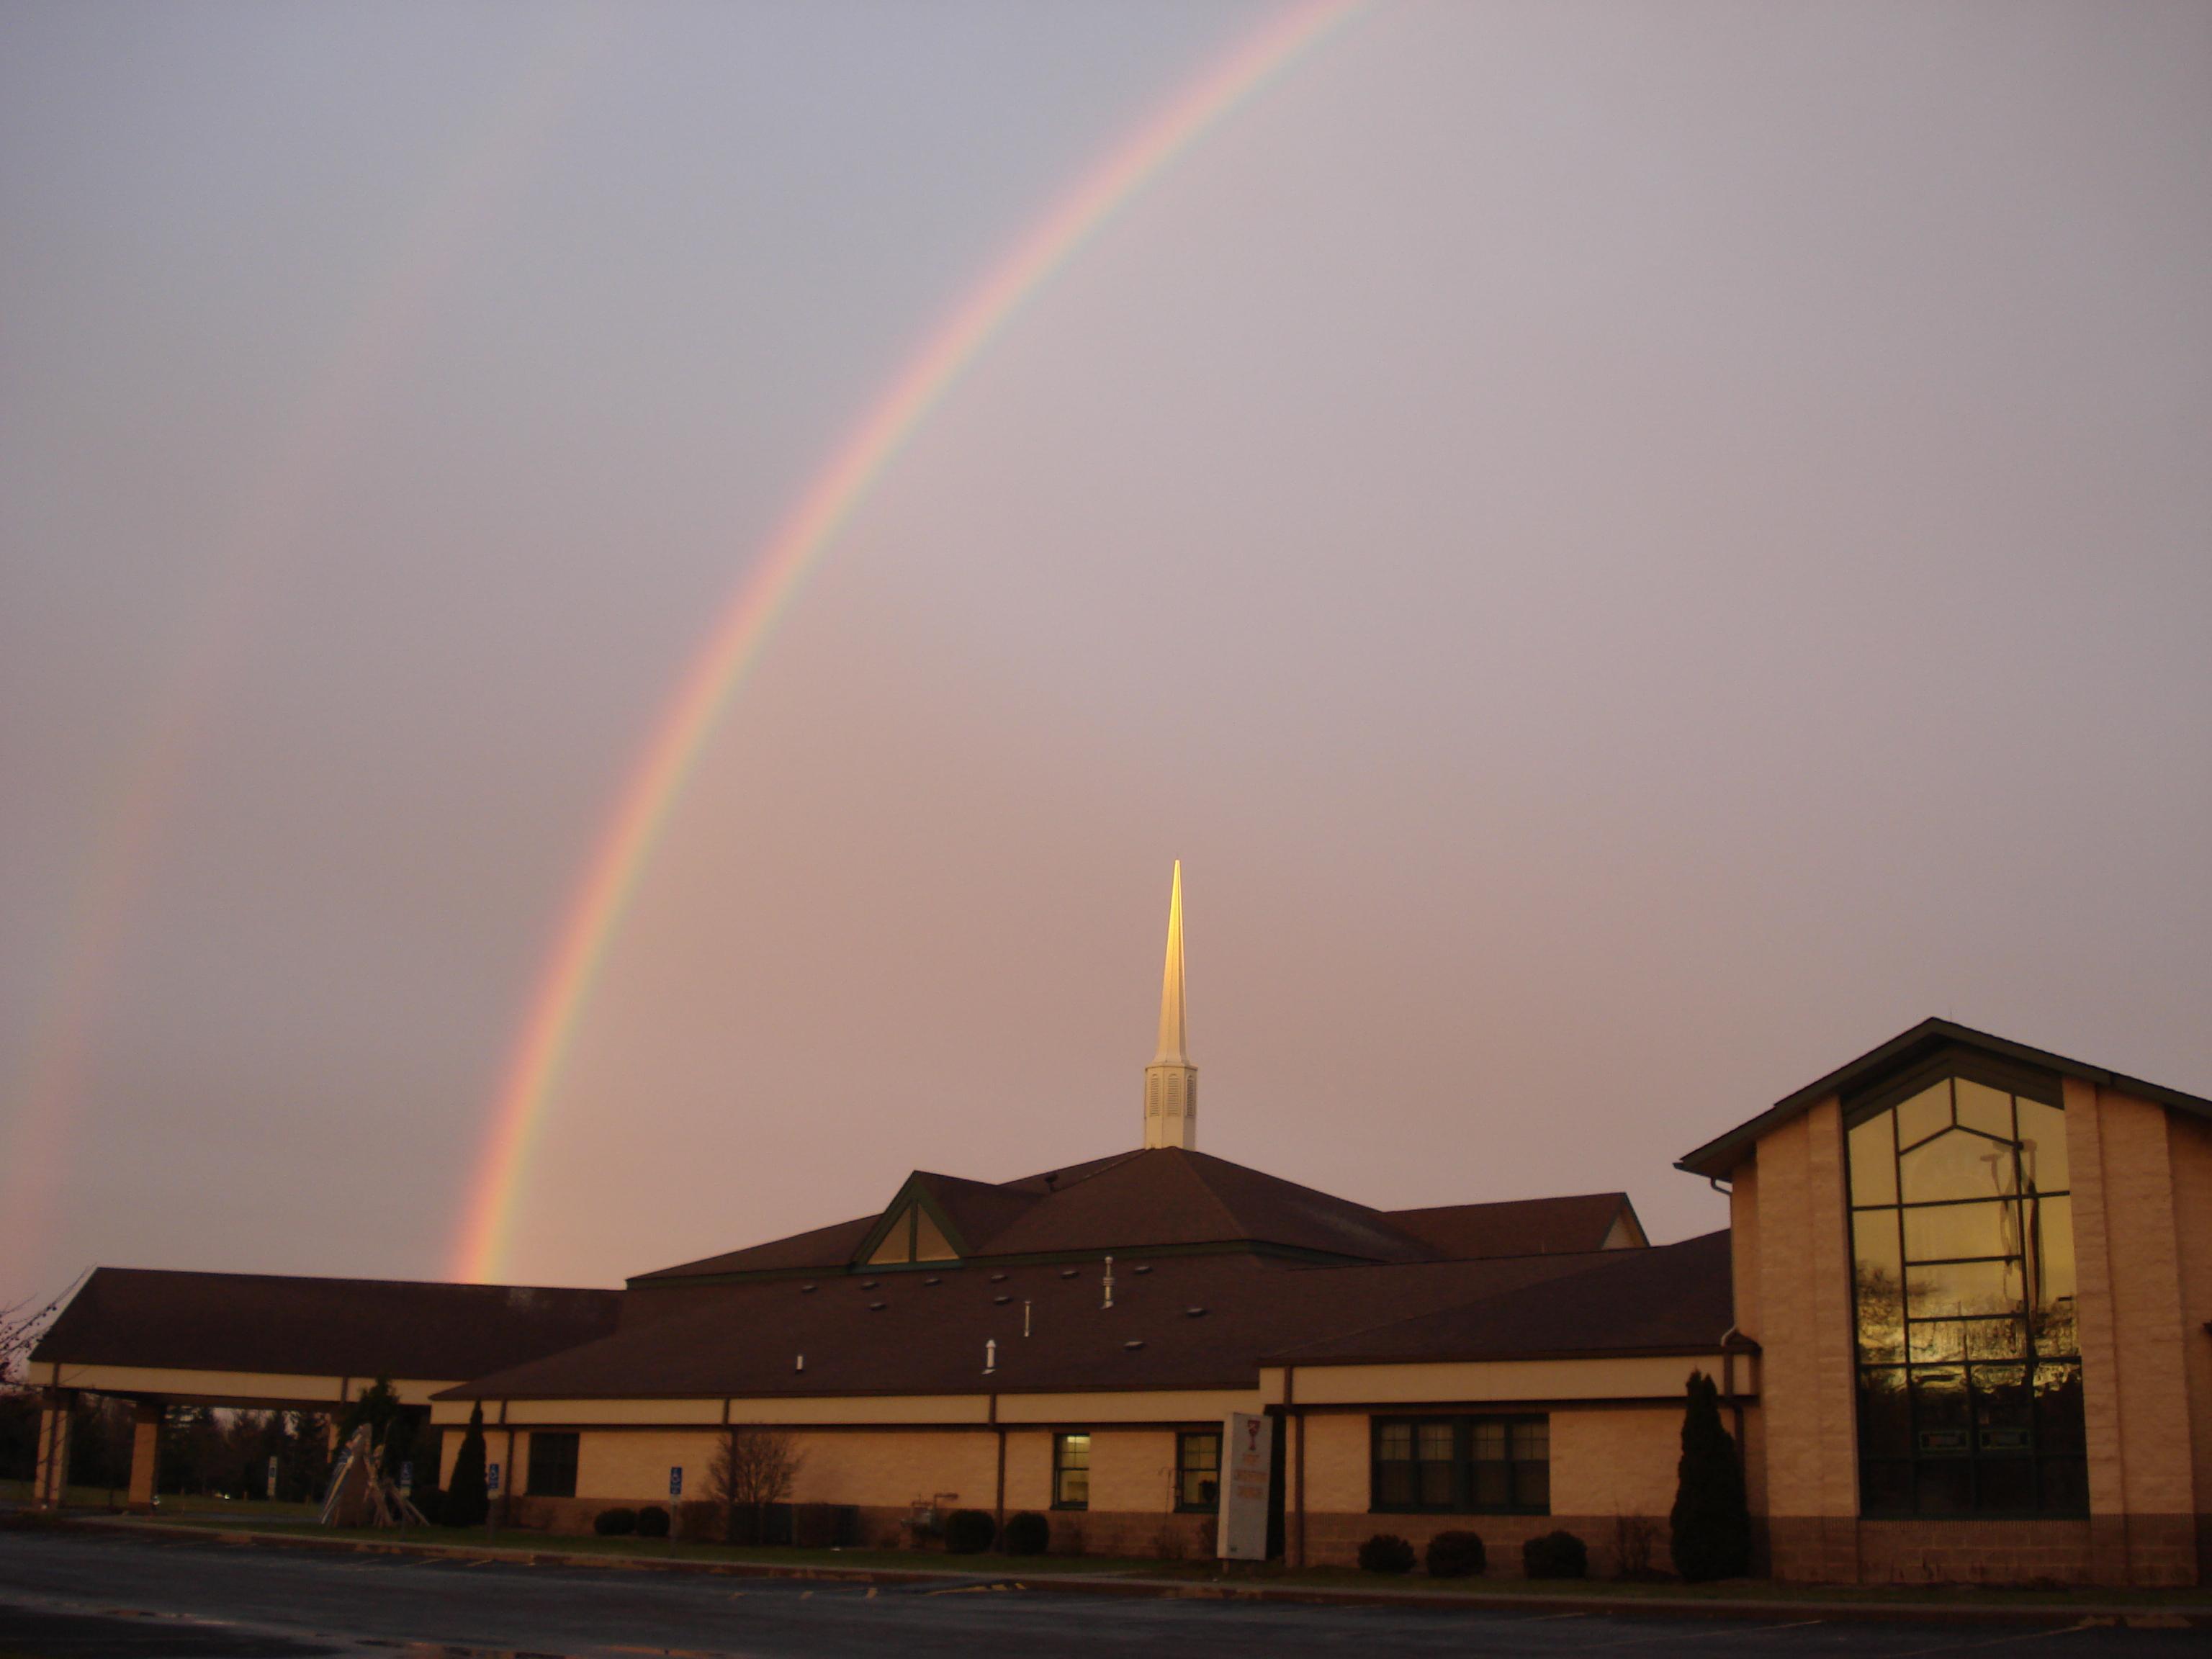 Rainbow blessing